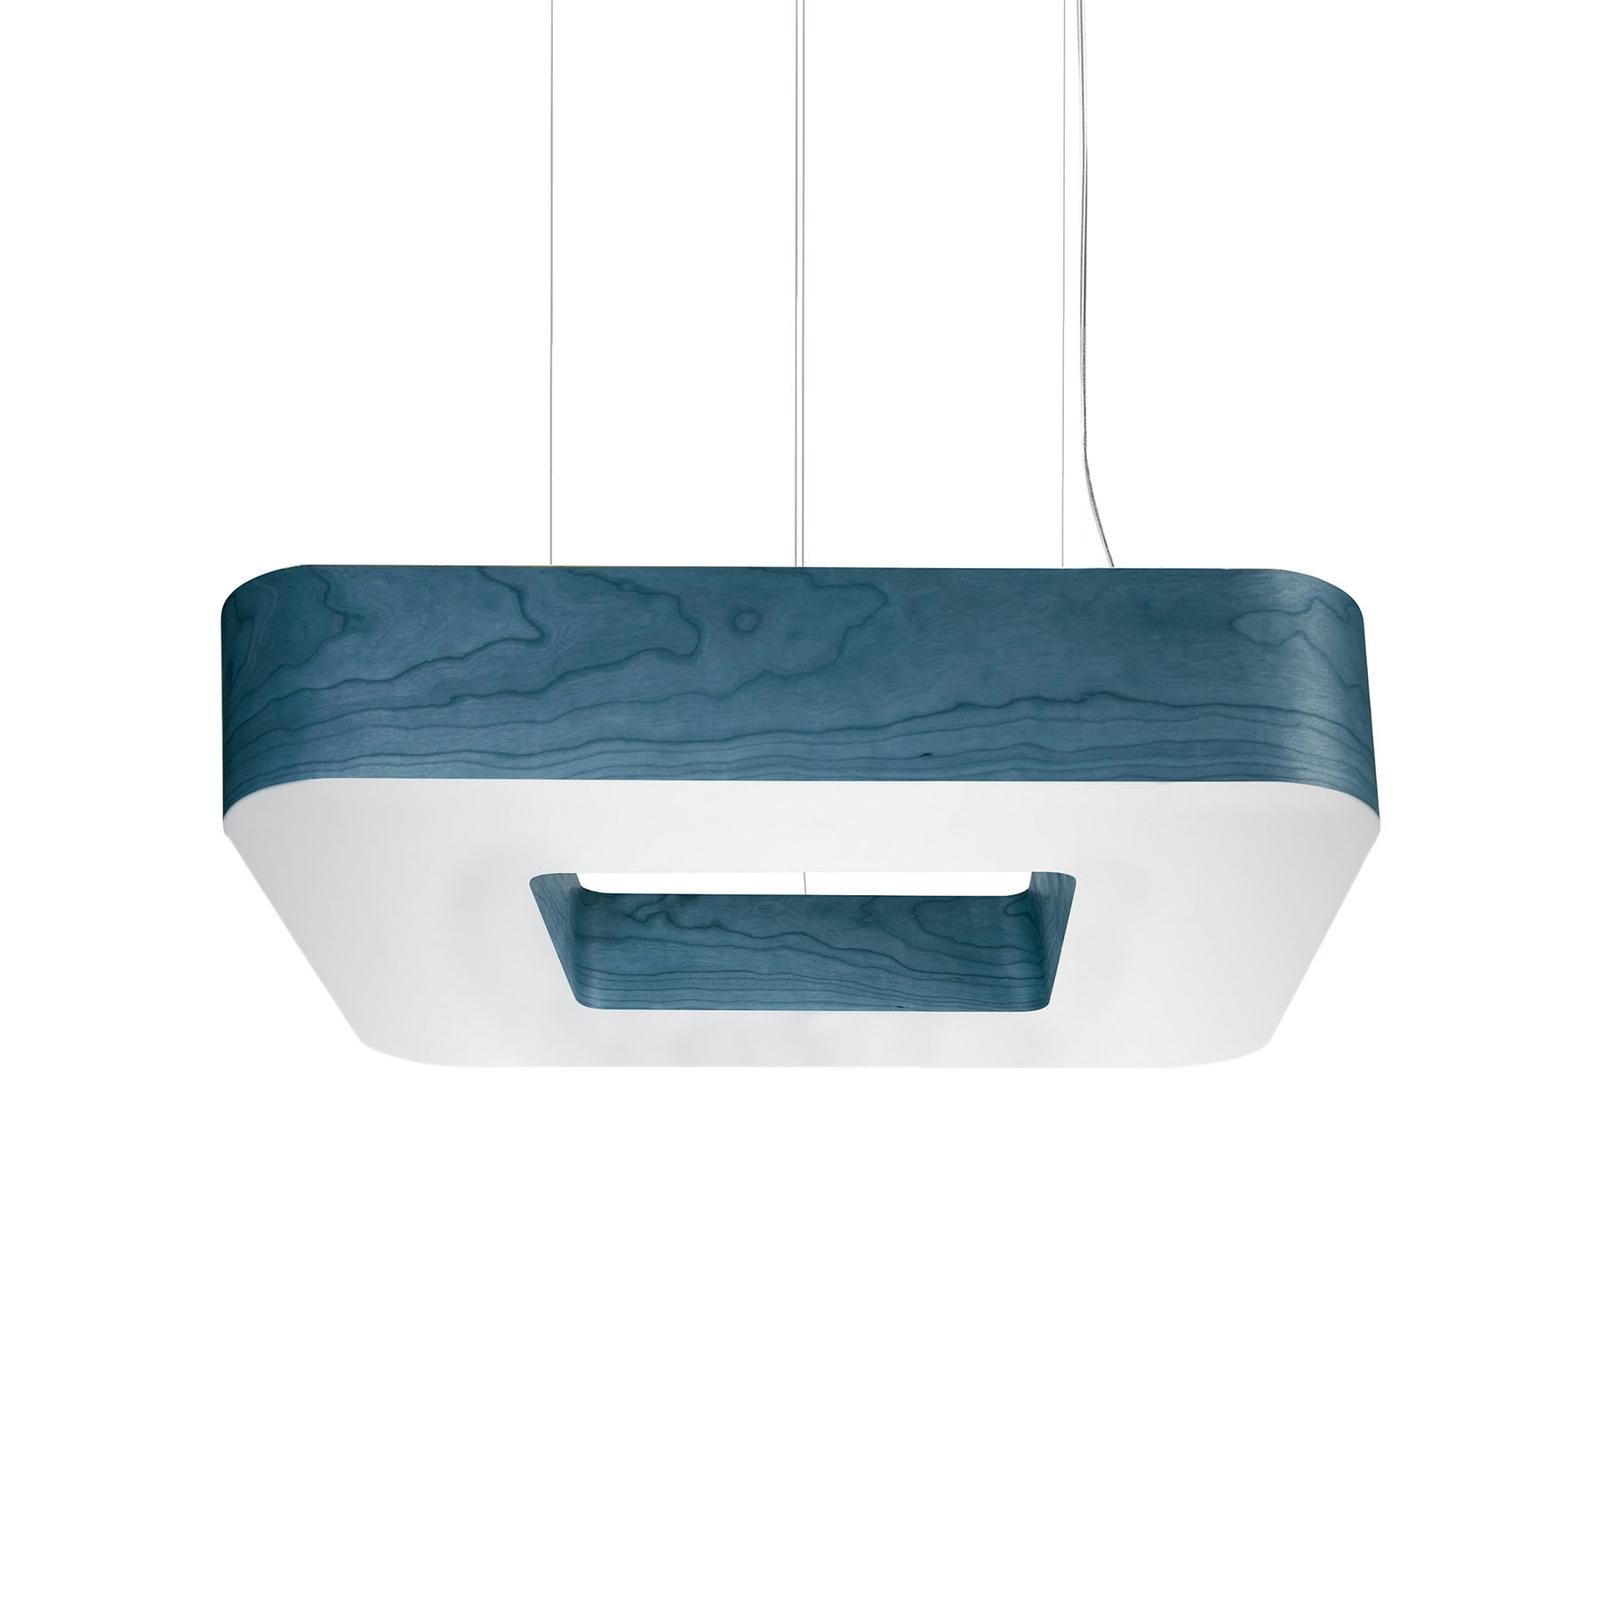 LZF Cuad LED-Hängeleuchte 0-10V dim, blau